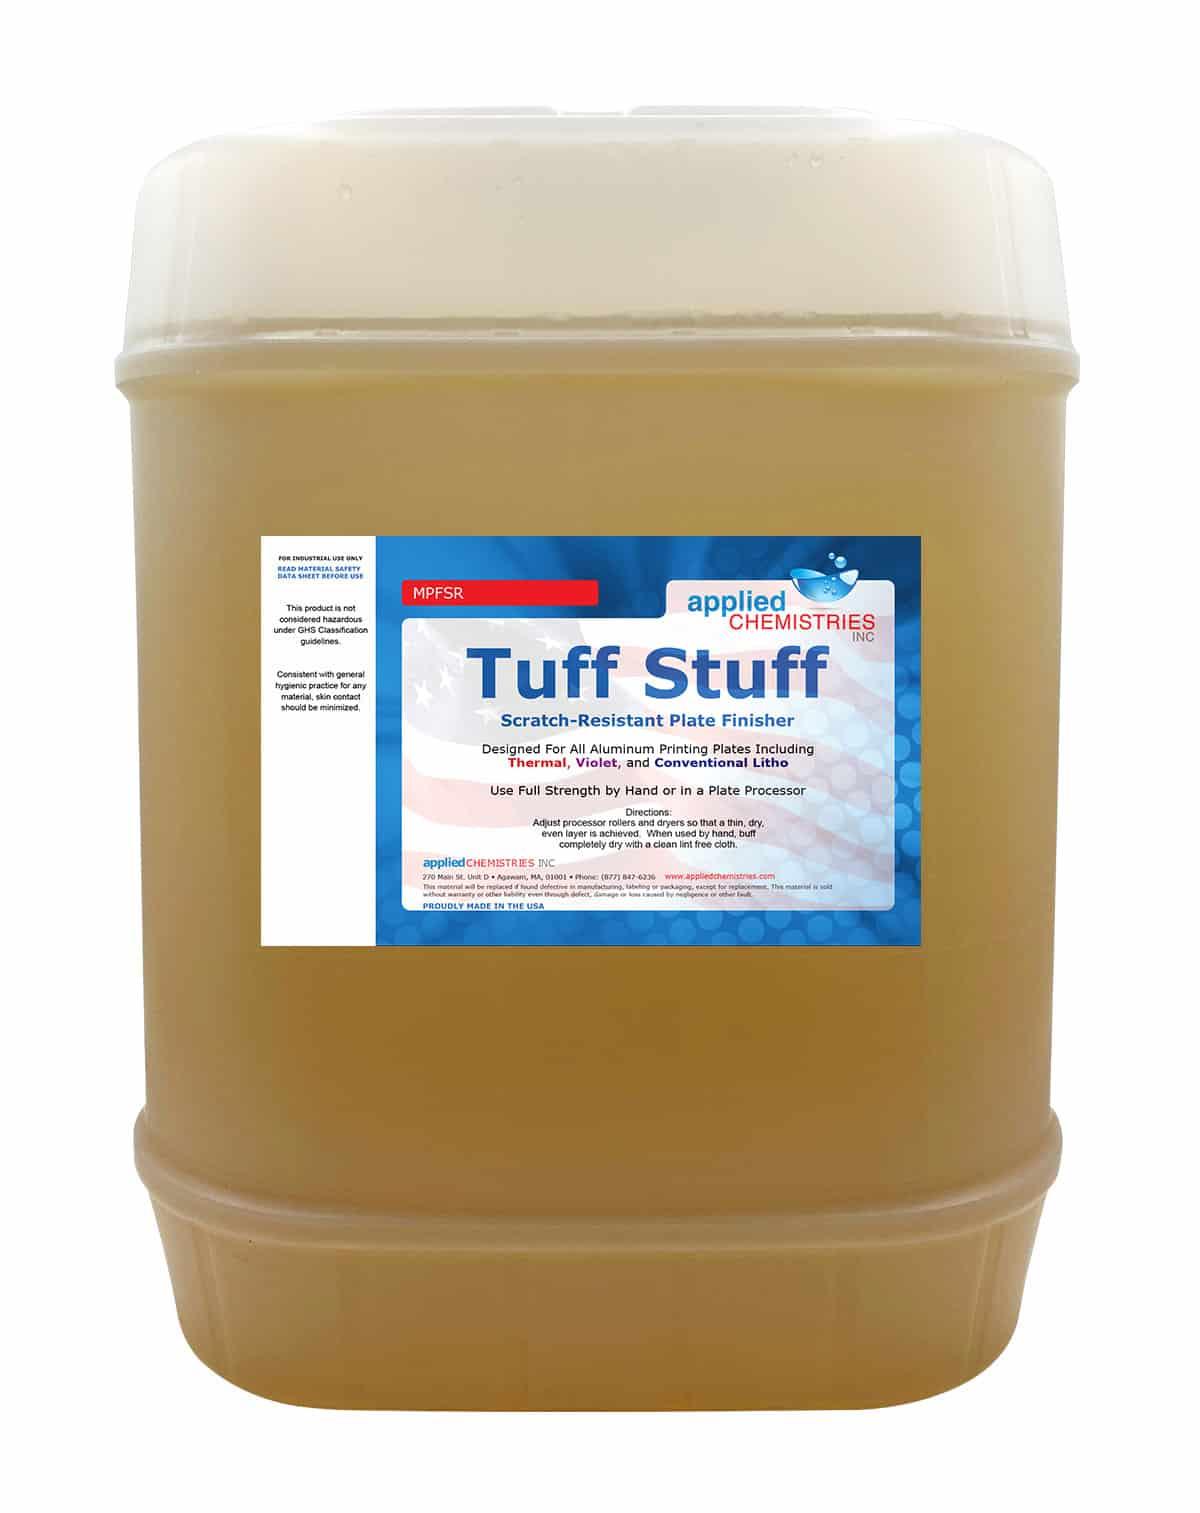 Tuff Stuff! Scratch Resistant Plate Finisher